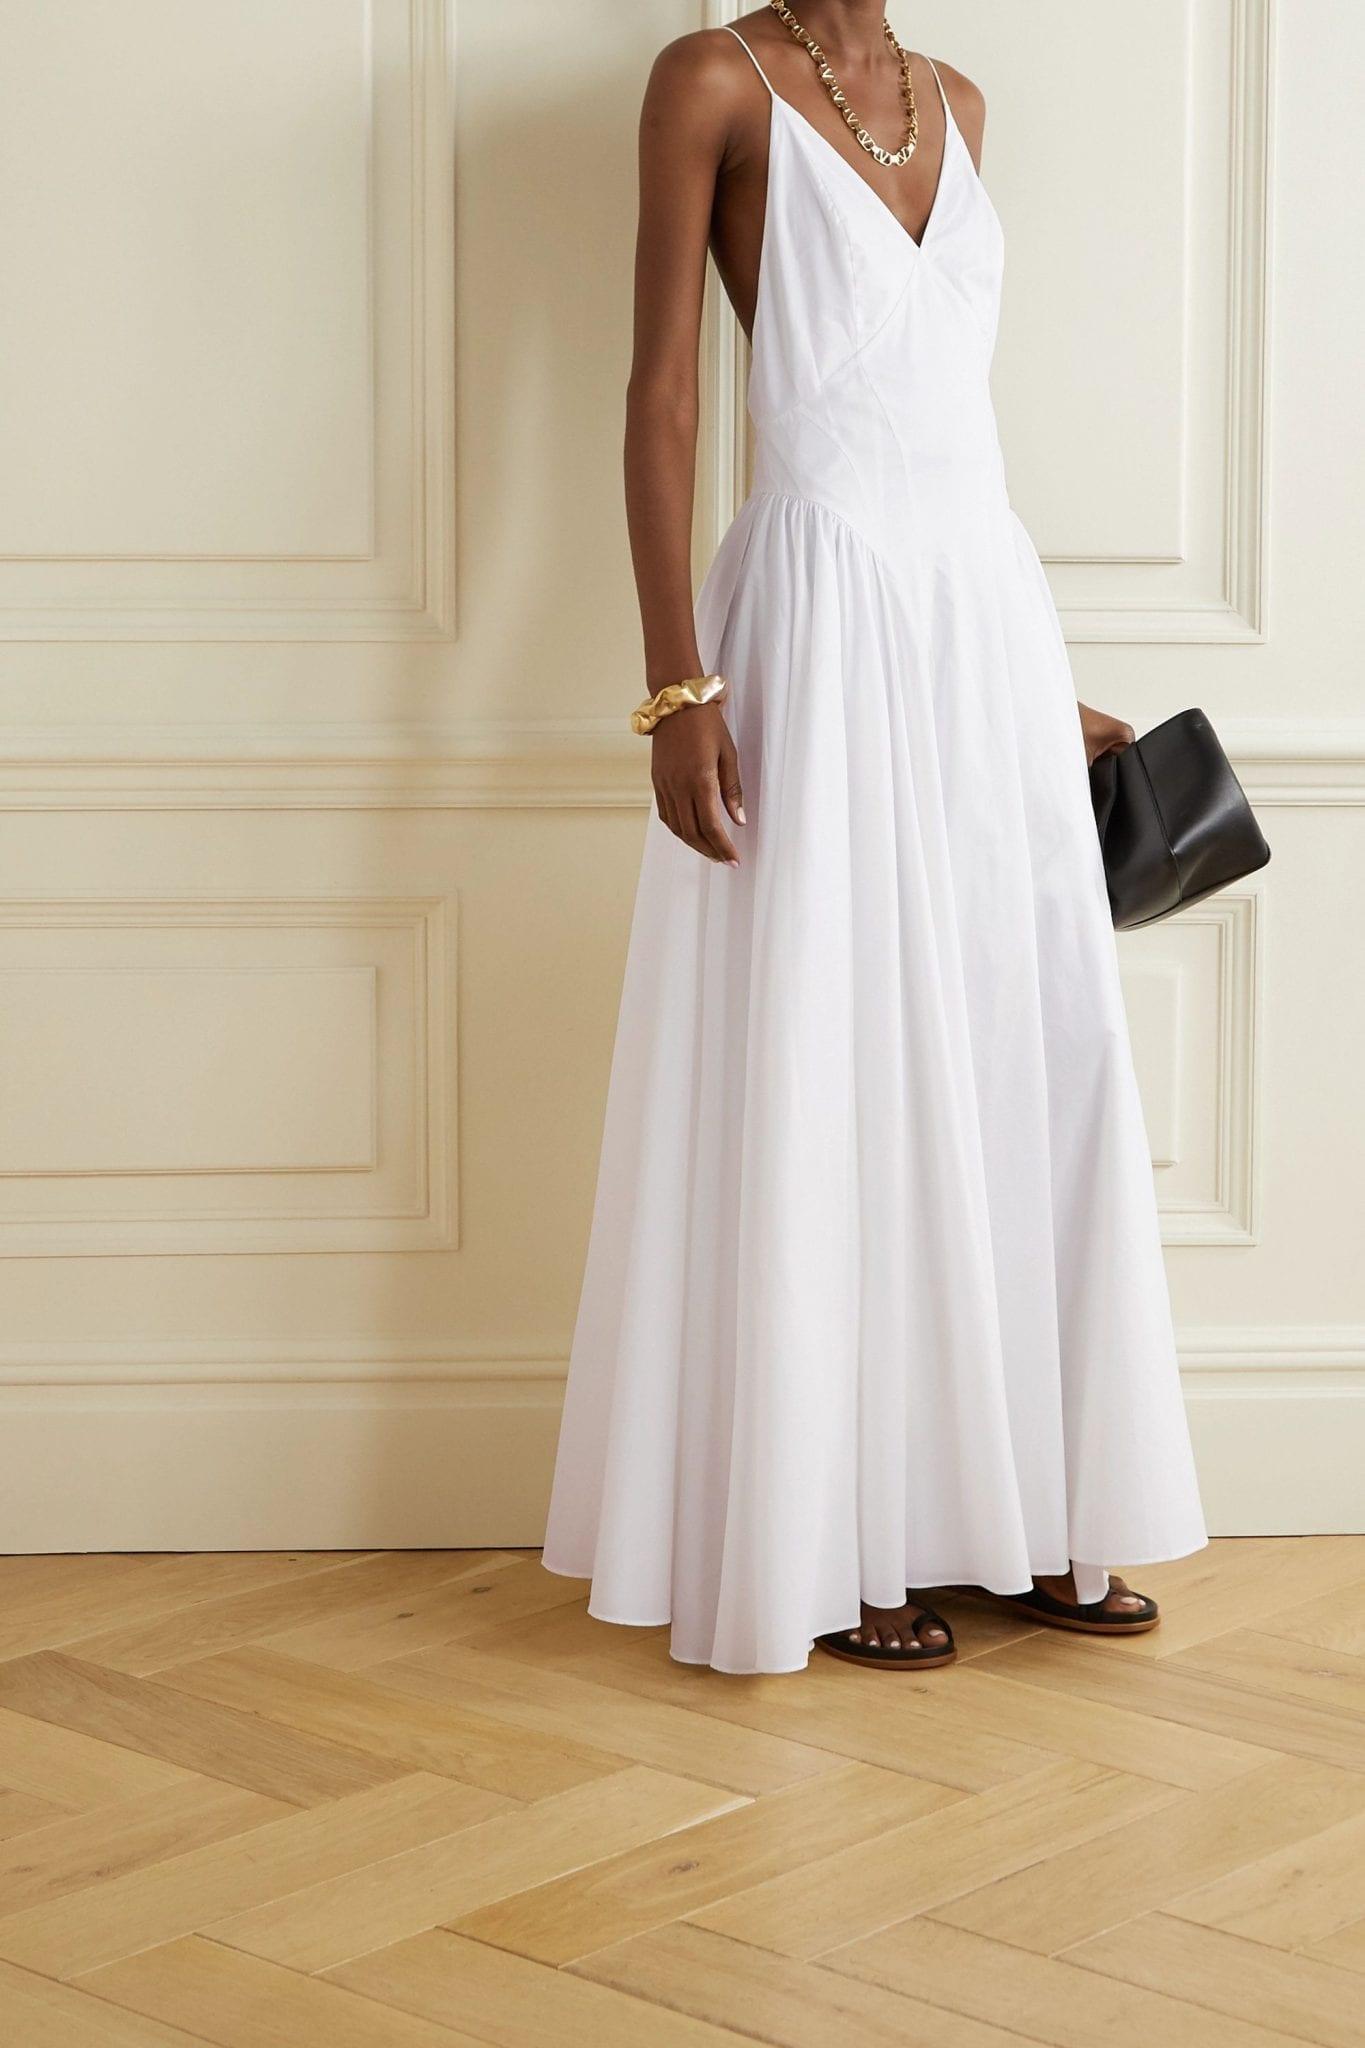 Tove Maren Organic Cotton White Maxi Dress We Select Dresses,Wedding Beautiful Night Dress